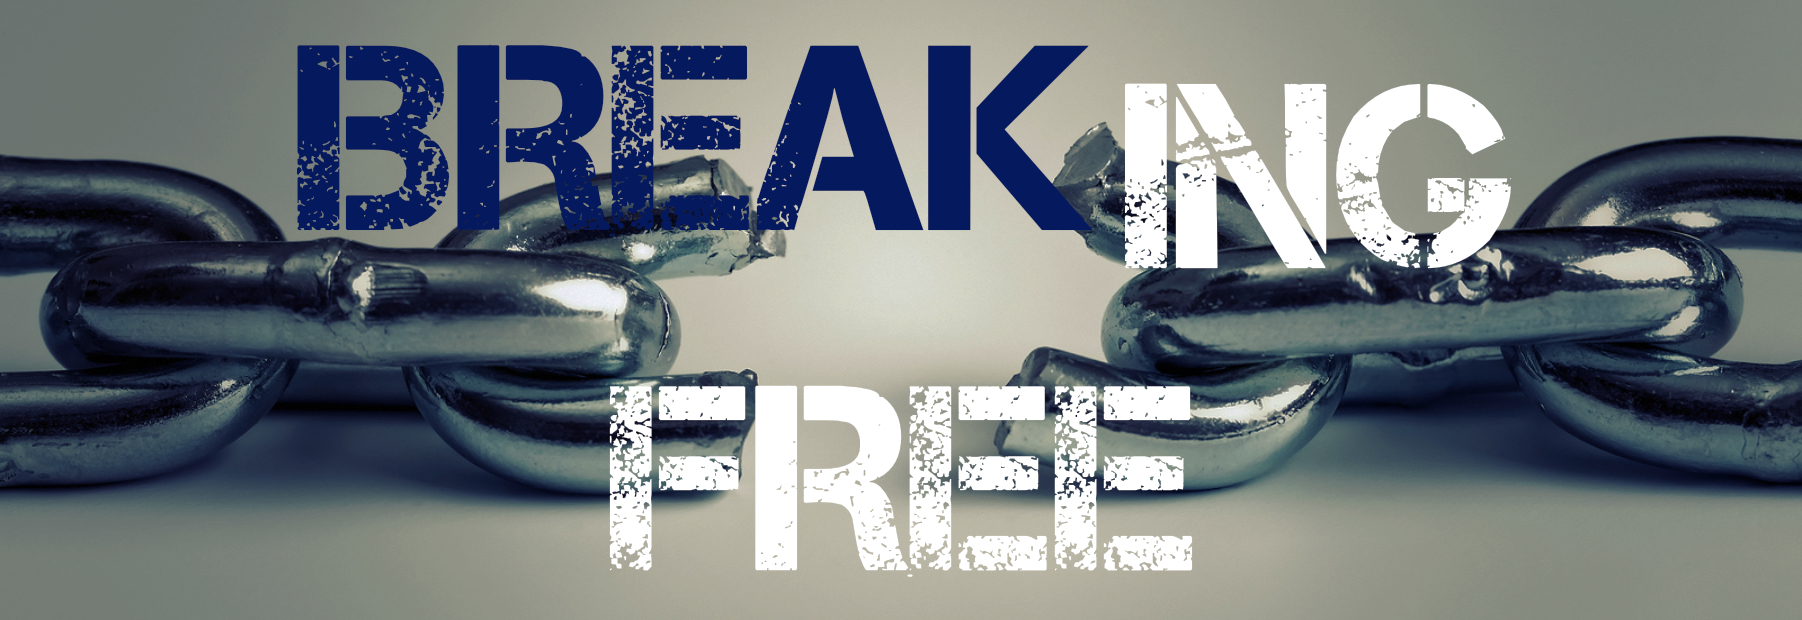 BREAKING FREE WEBBANNER.jpg